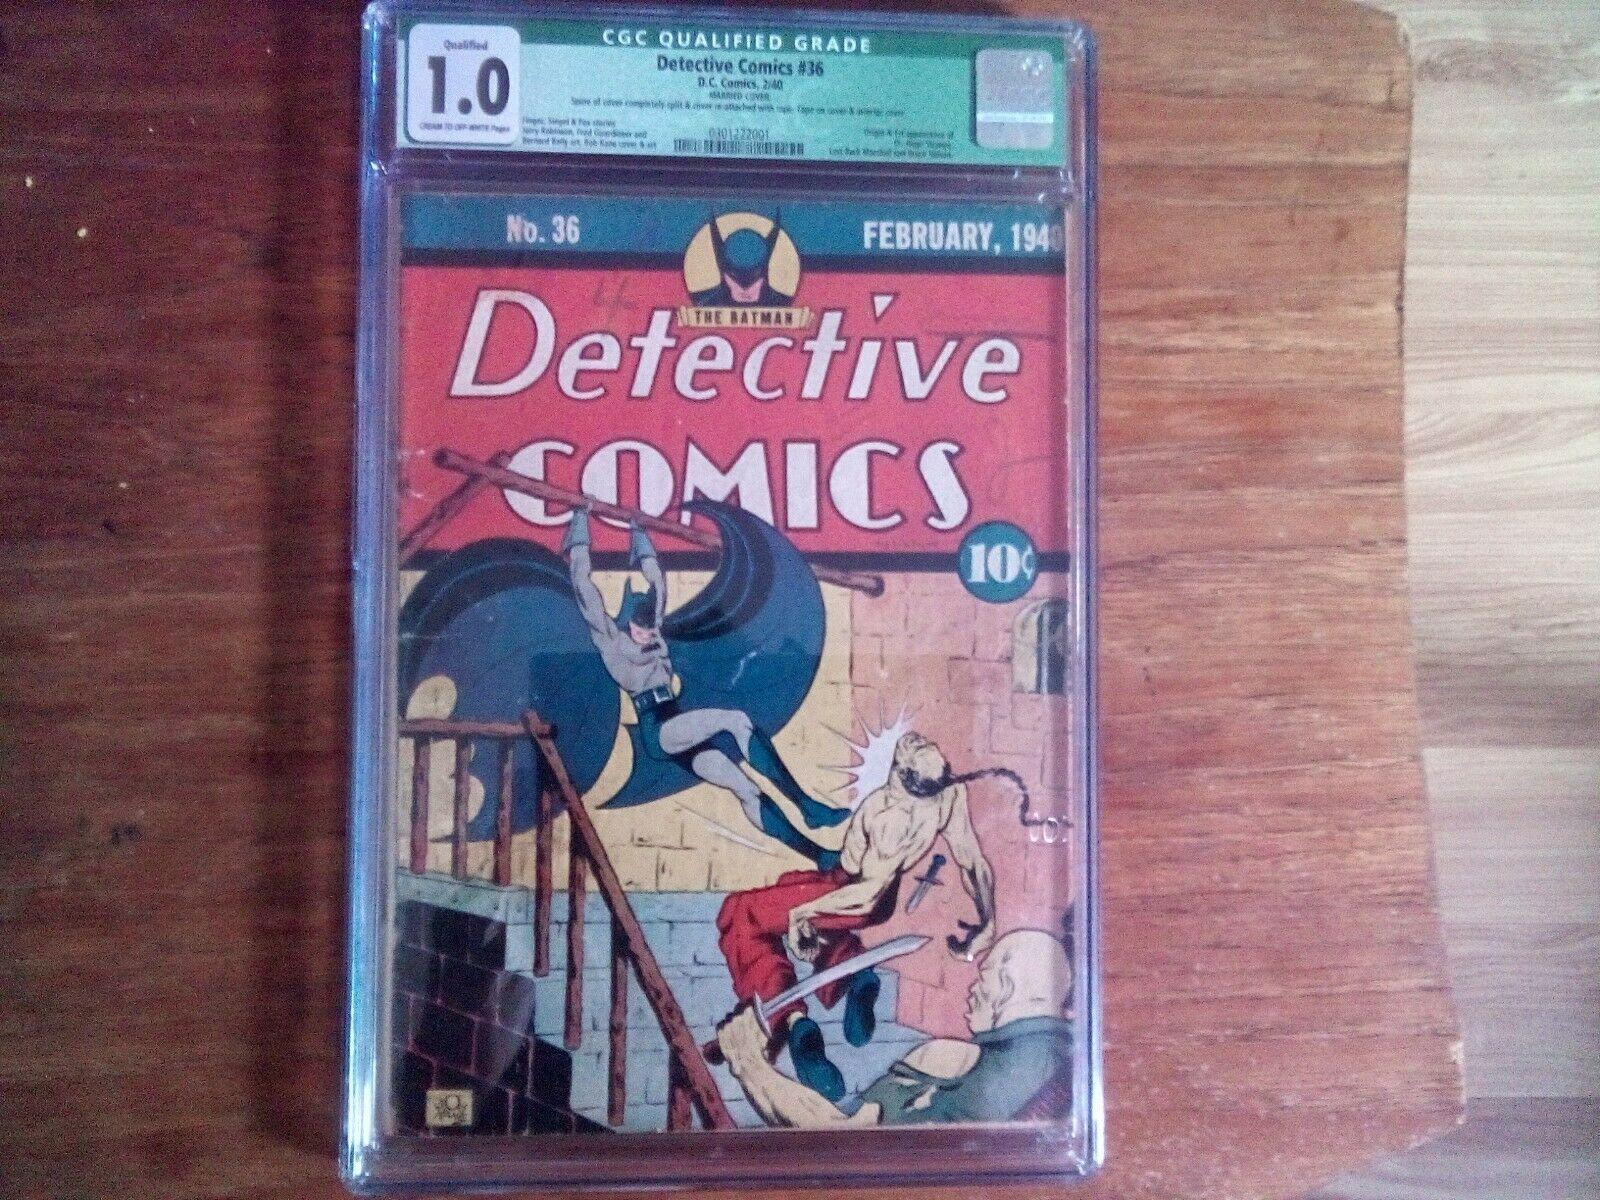 DETECTIVE COMICS 36 CGC 50 VGFN OWW DC 1940 1ST HUGO STRANGE GOLDEN AGE BATMAN